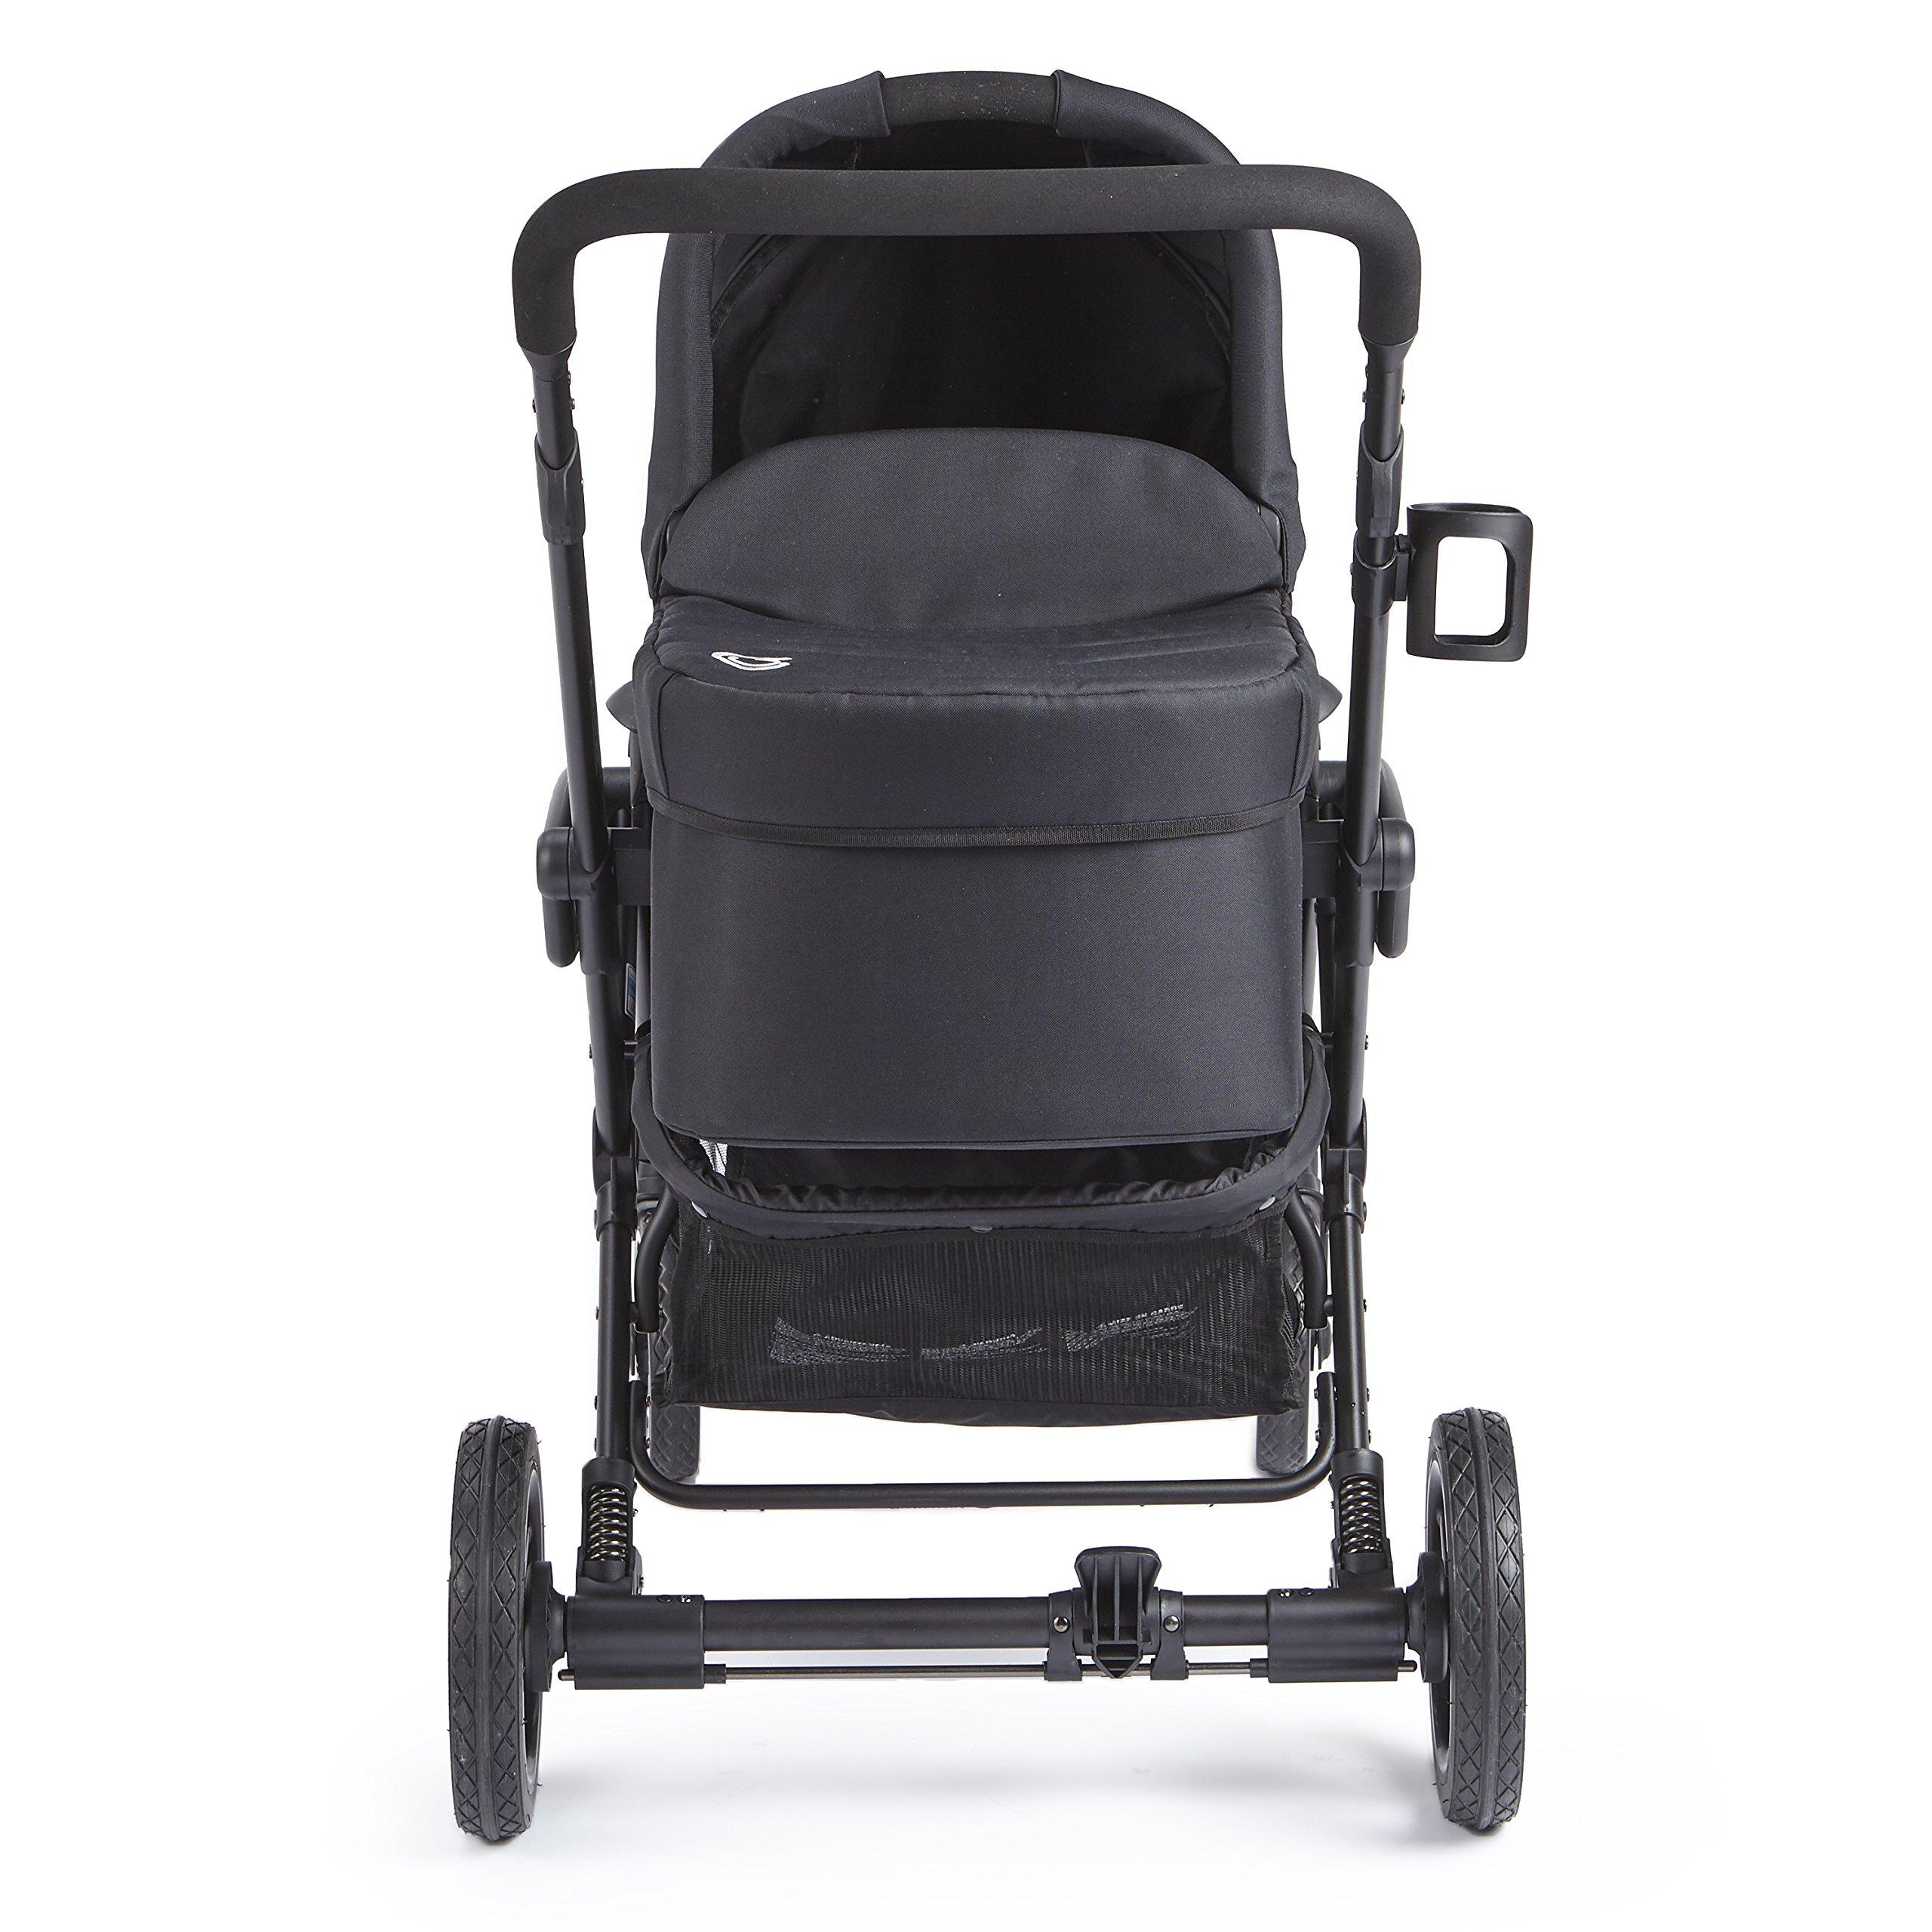 Contours Bassinet Accessory for Contours Options, Contours Options Elite, Contours Curve Tandem Double Strollers, Black by Contours (Image #5)